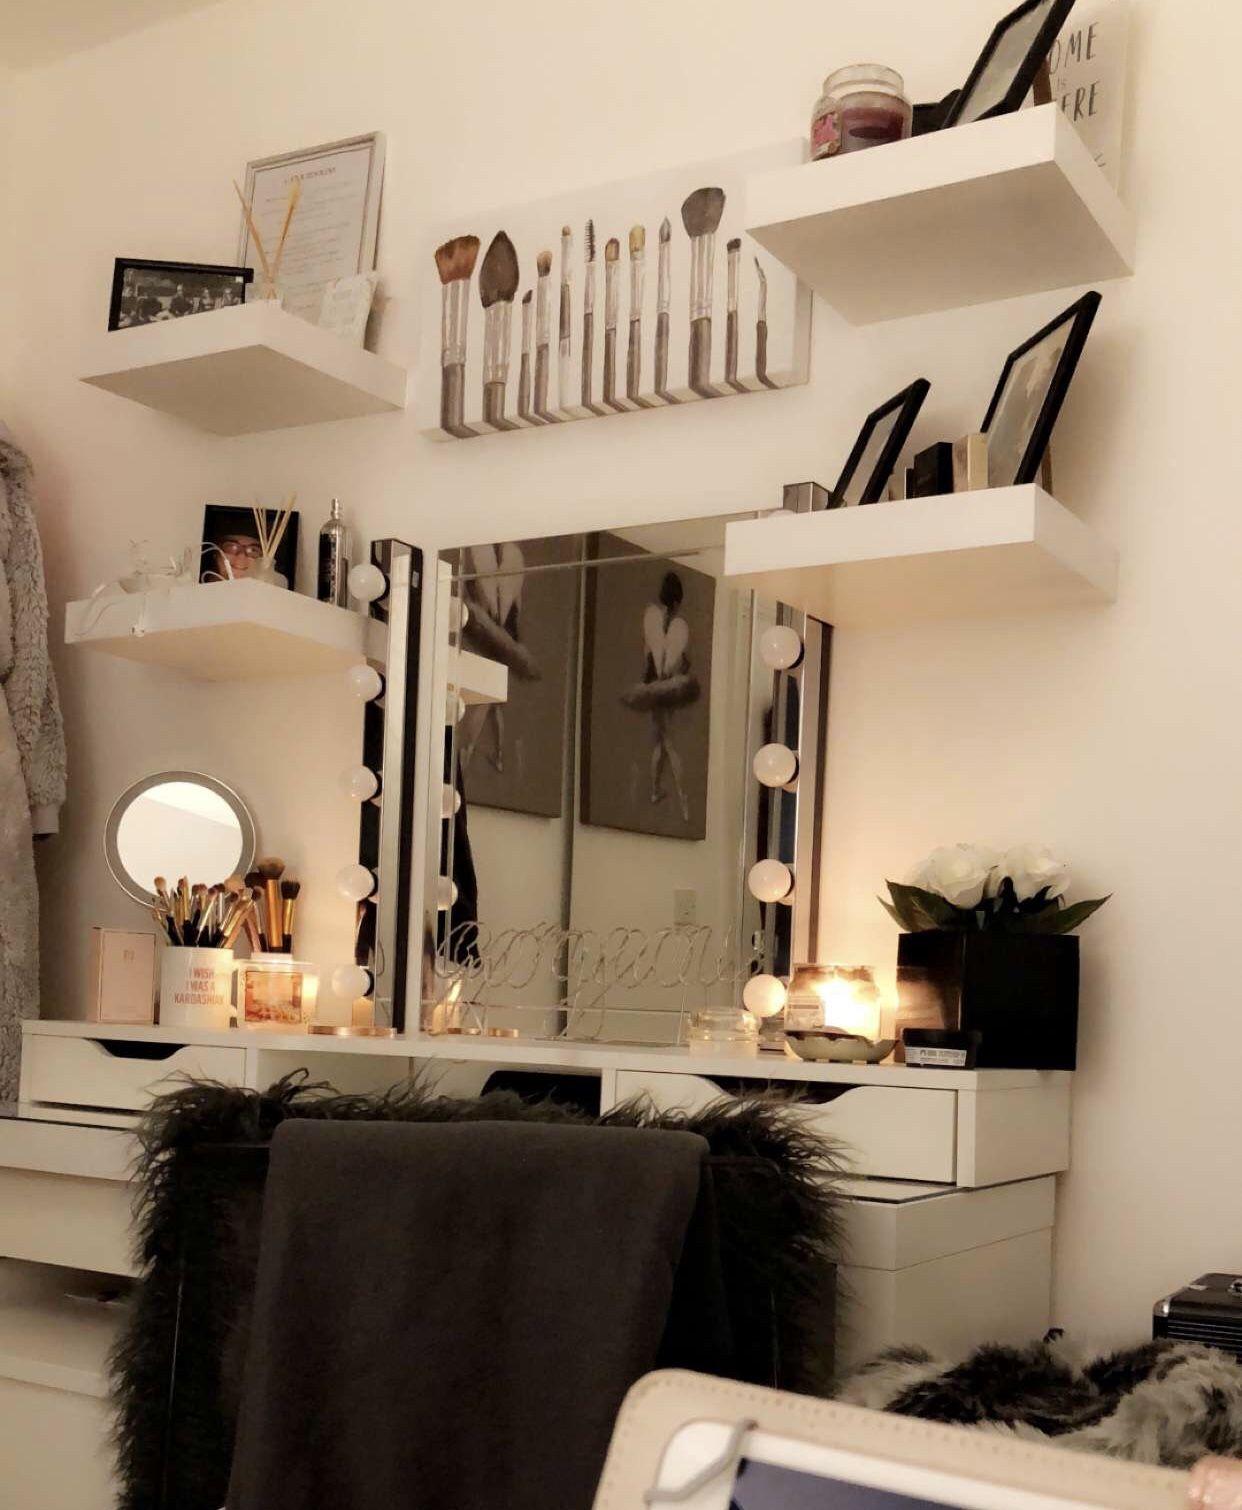 Bedroom Homedecor Vanity Ikea Inspo White Grey Black Makeup Shelves Mirror Vanity Room Decor Shelf Decor Bedroom Modern Bedroom Furniture